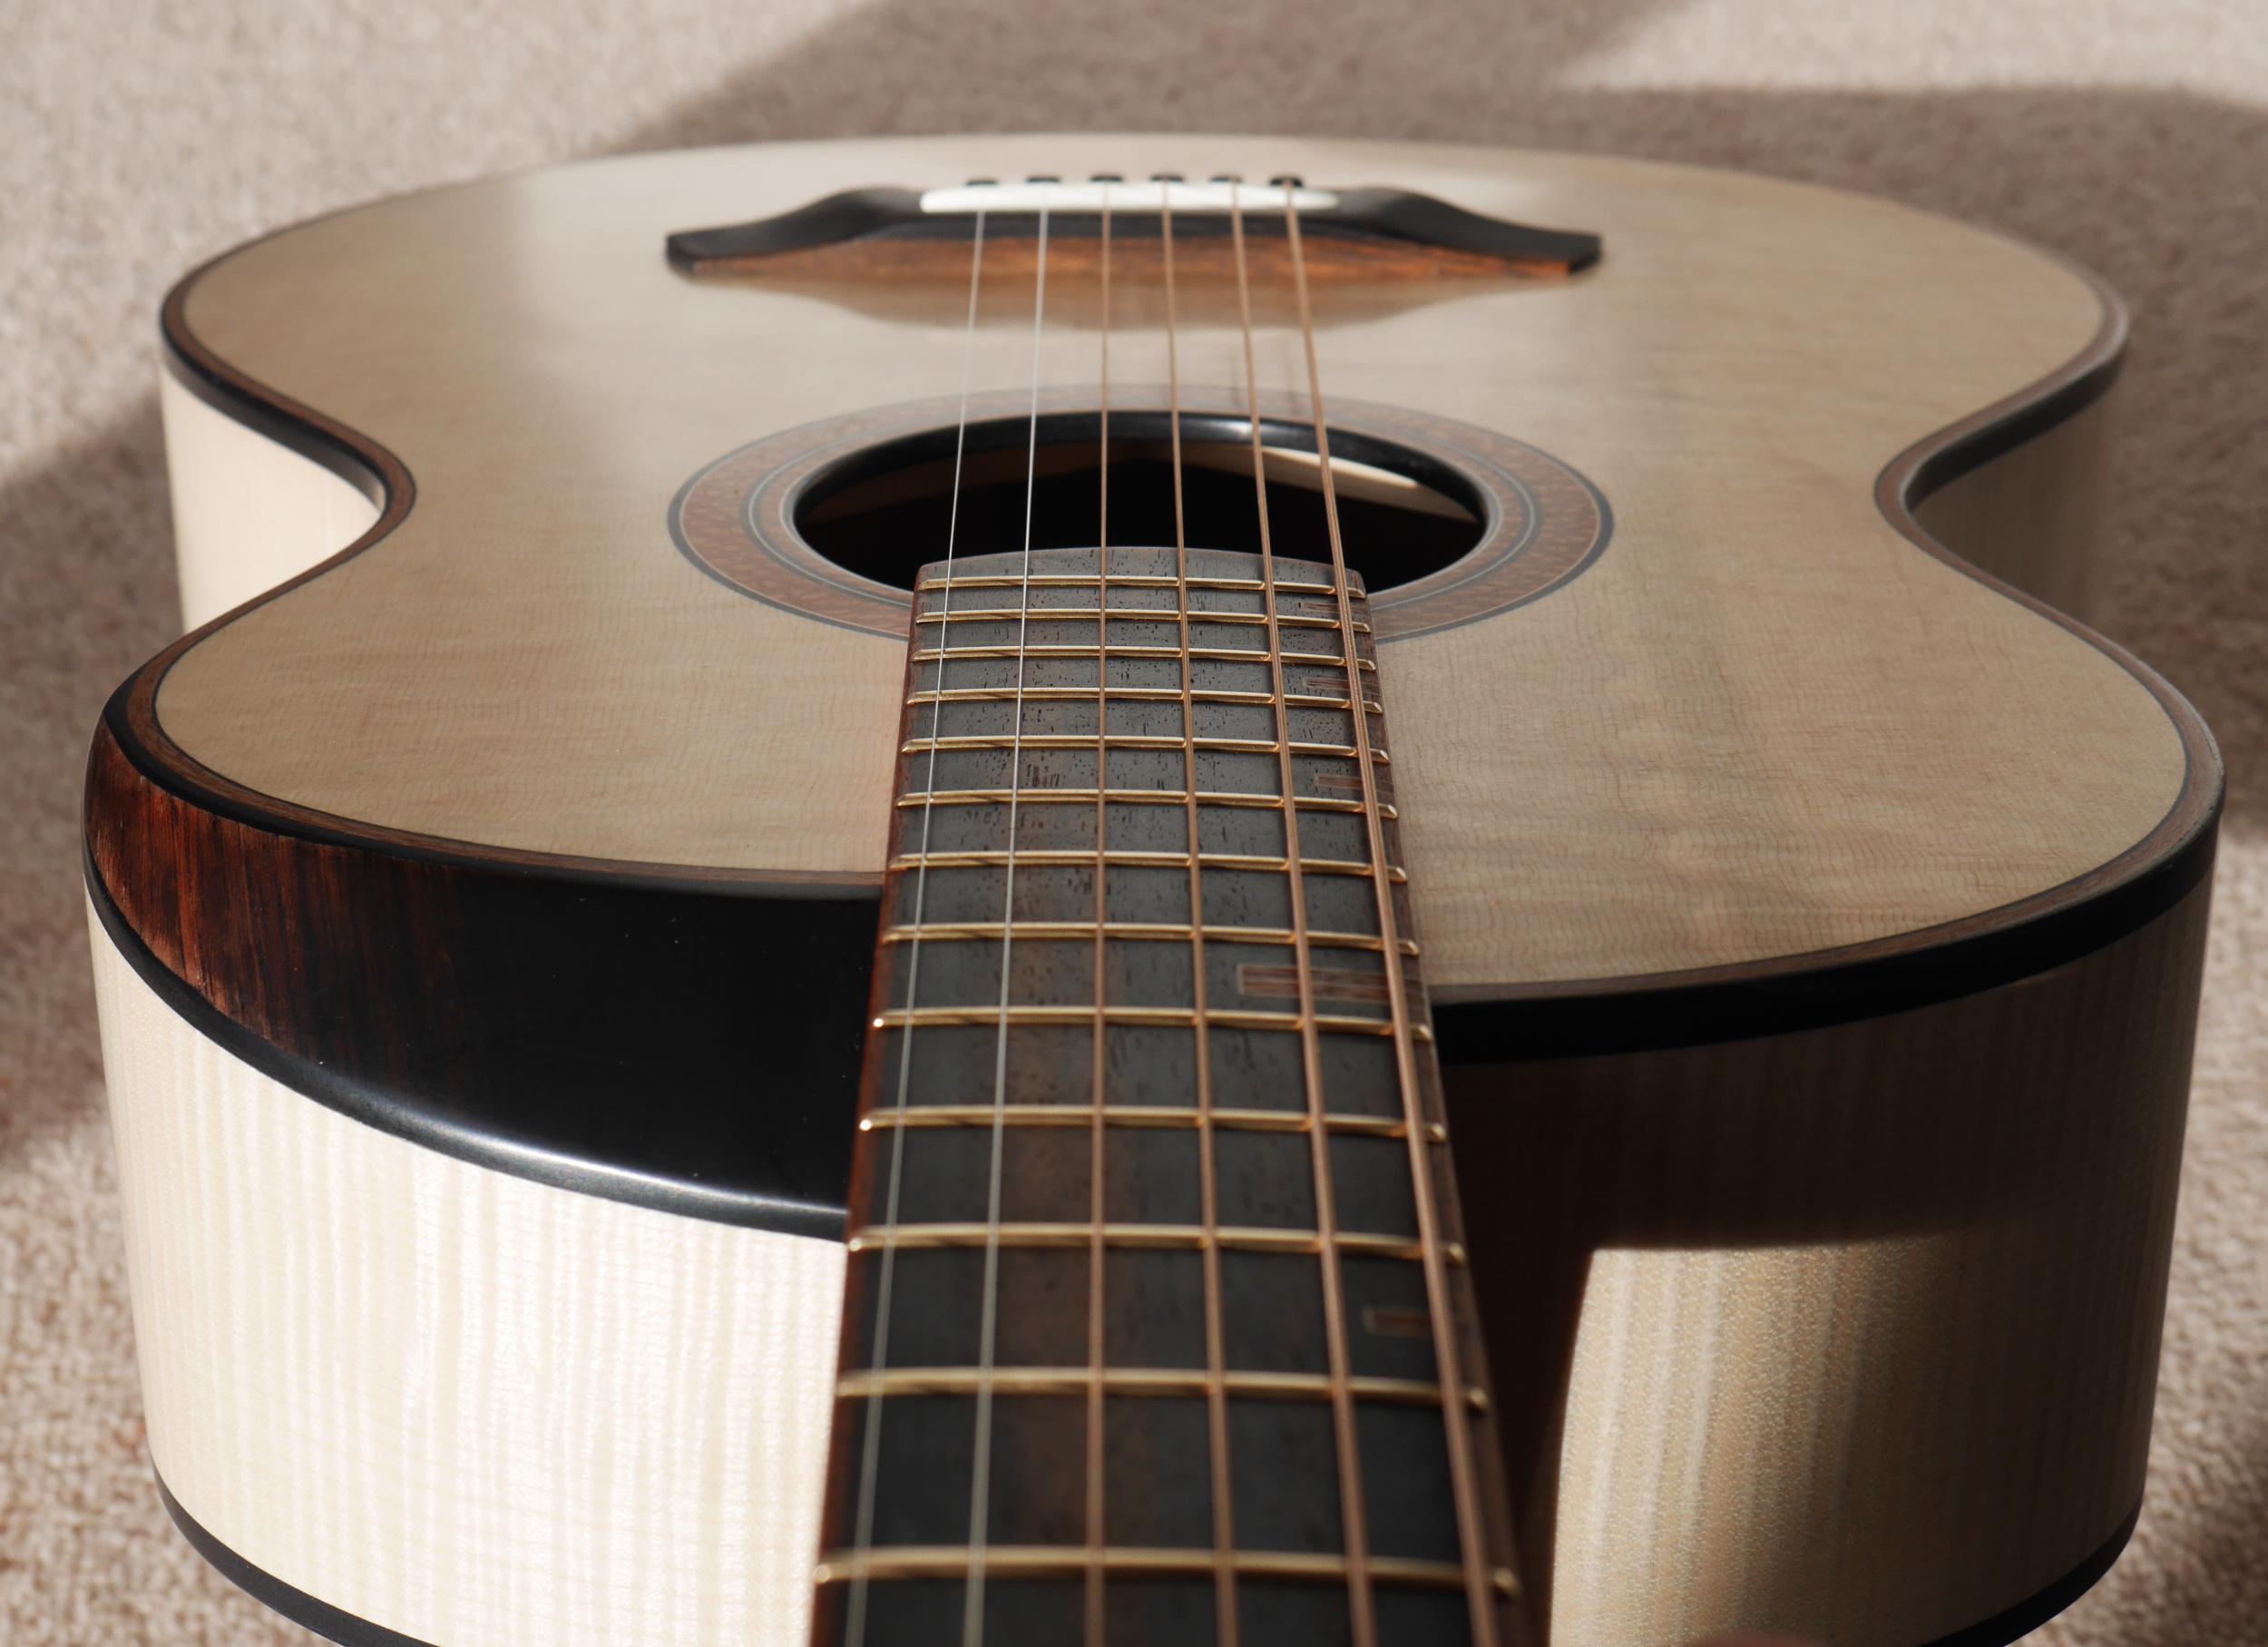 bevel guitar, flamed maple, bear claw spruce